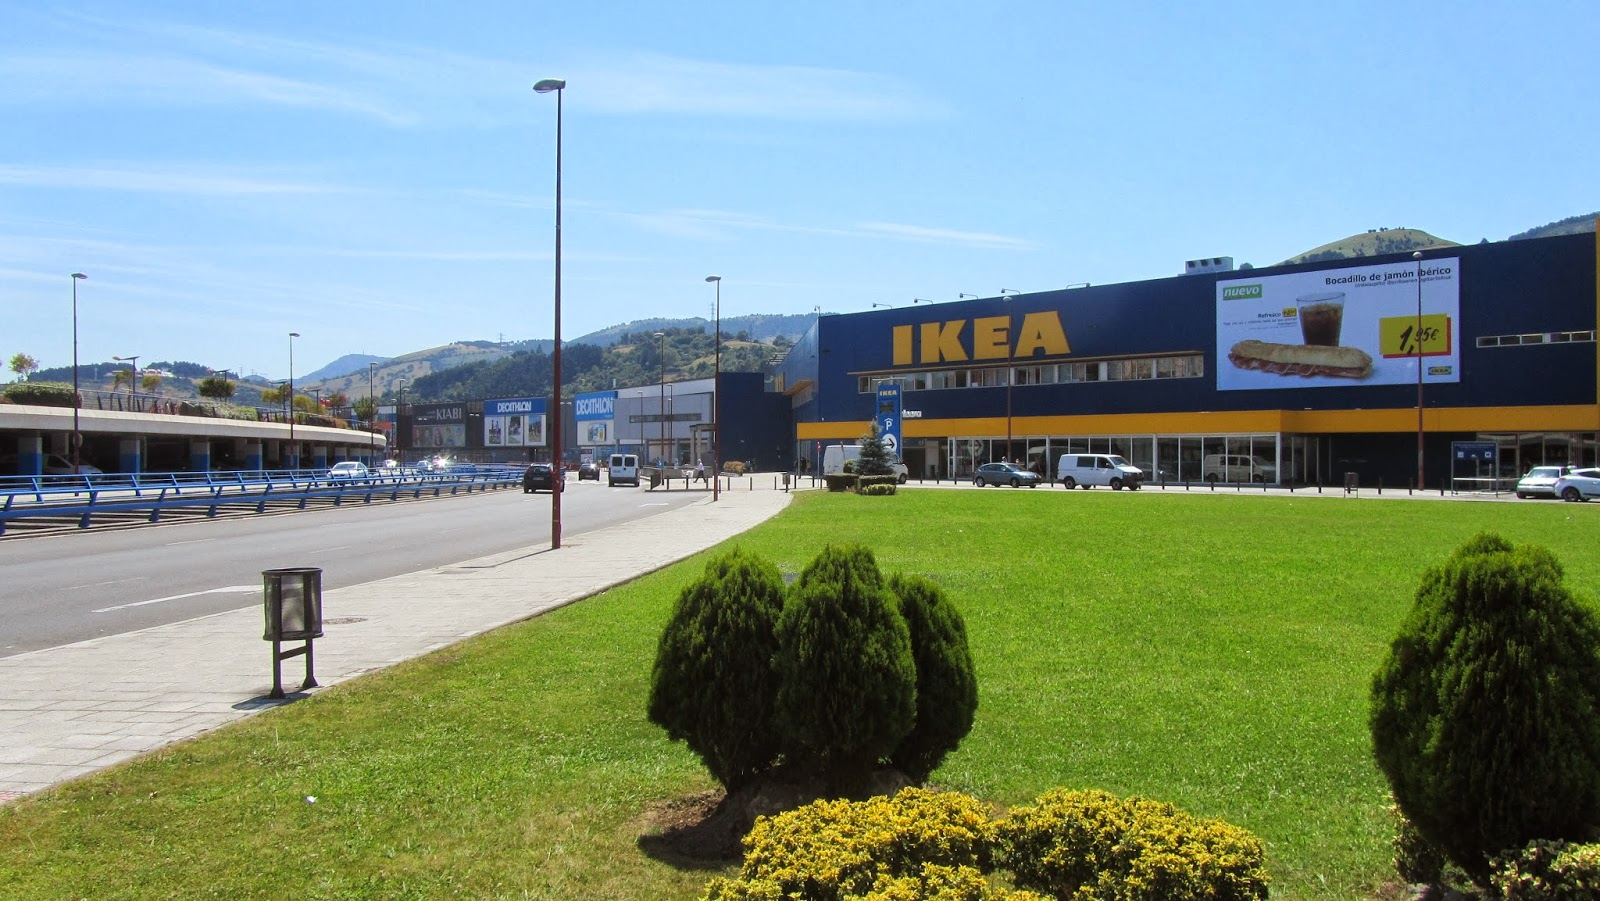 Ikea Barakaldo celebra su noveno aniversario con más de 27